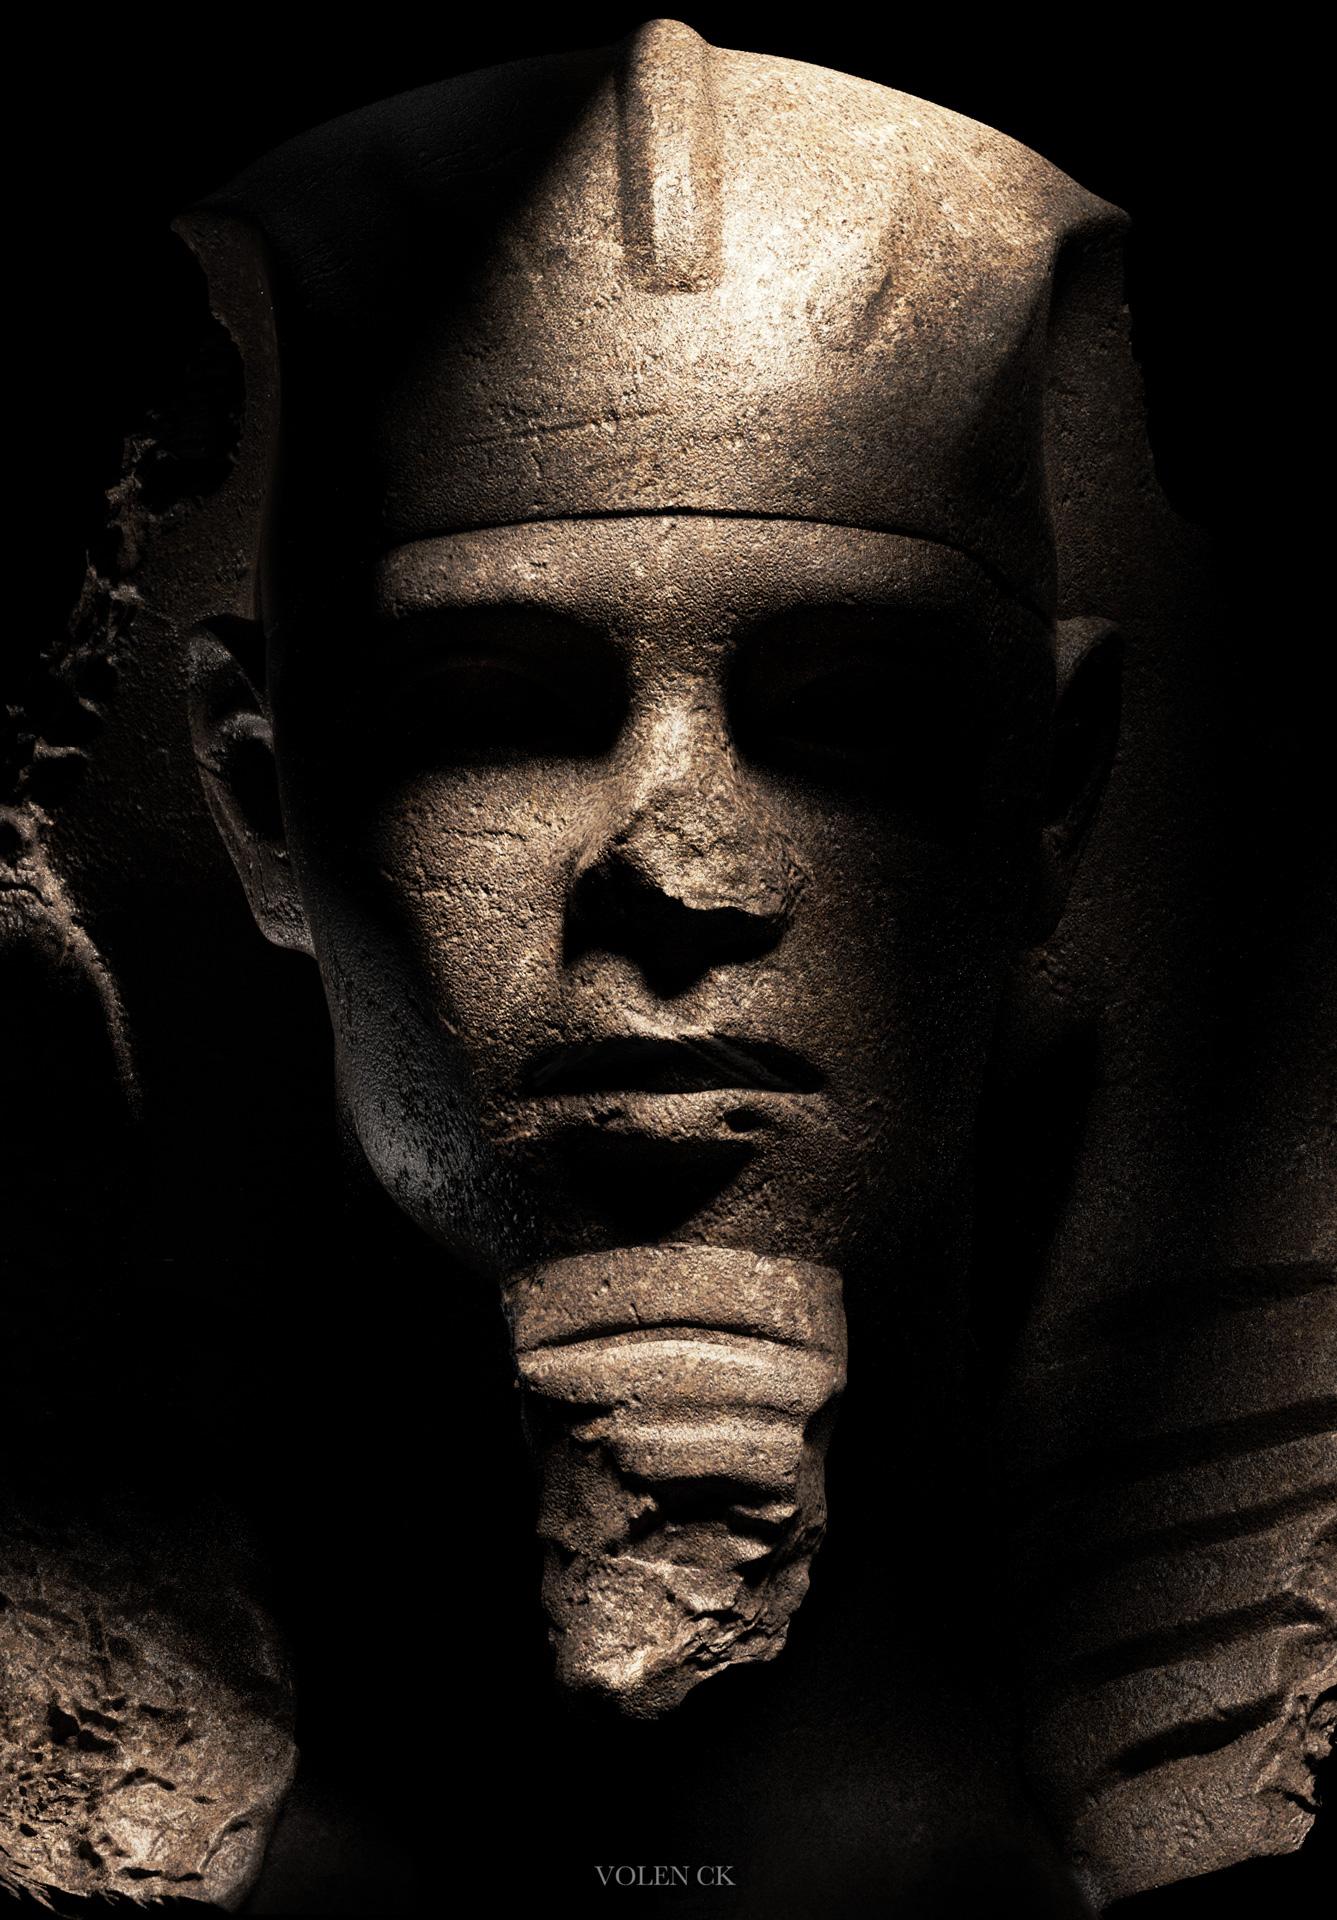 Forgotten-Pharaoh_2_Concept-Design-Illustration---Volen-CK-